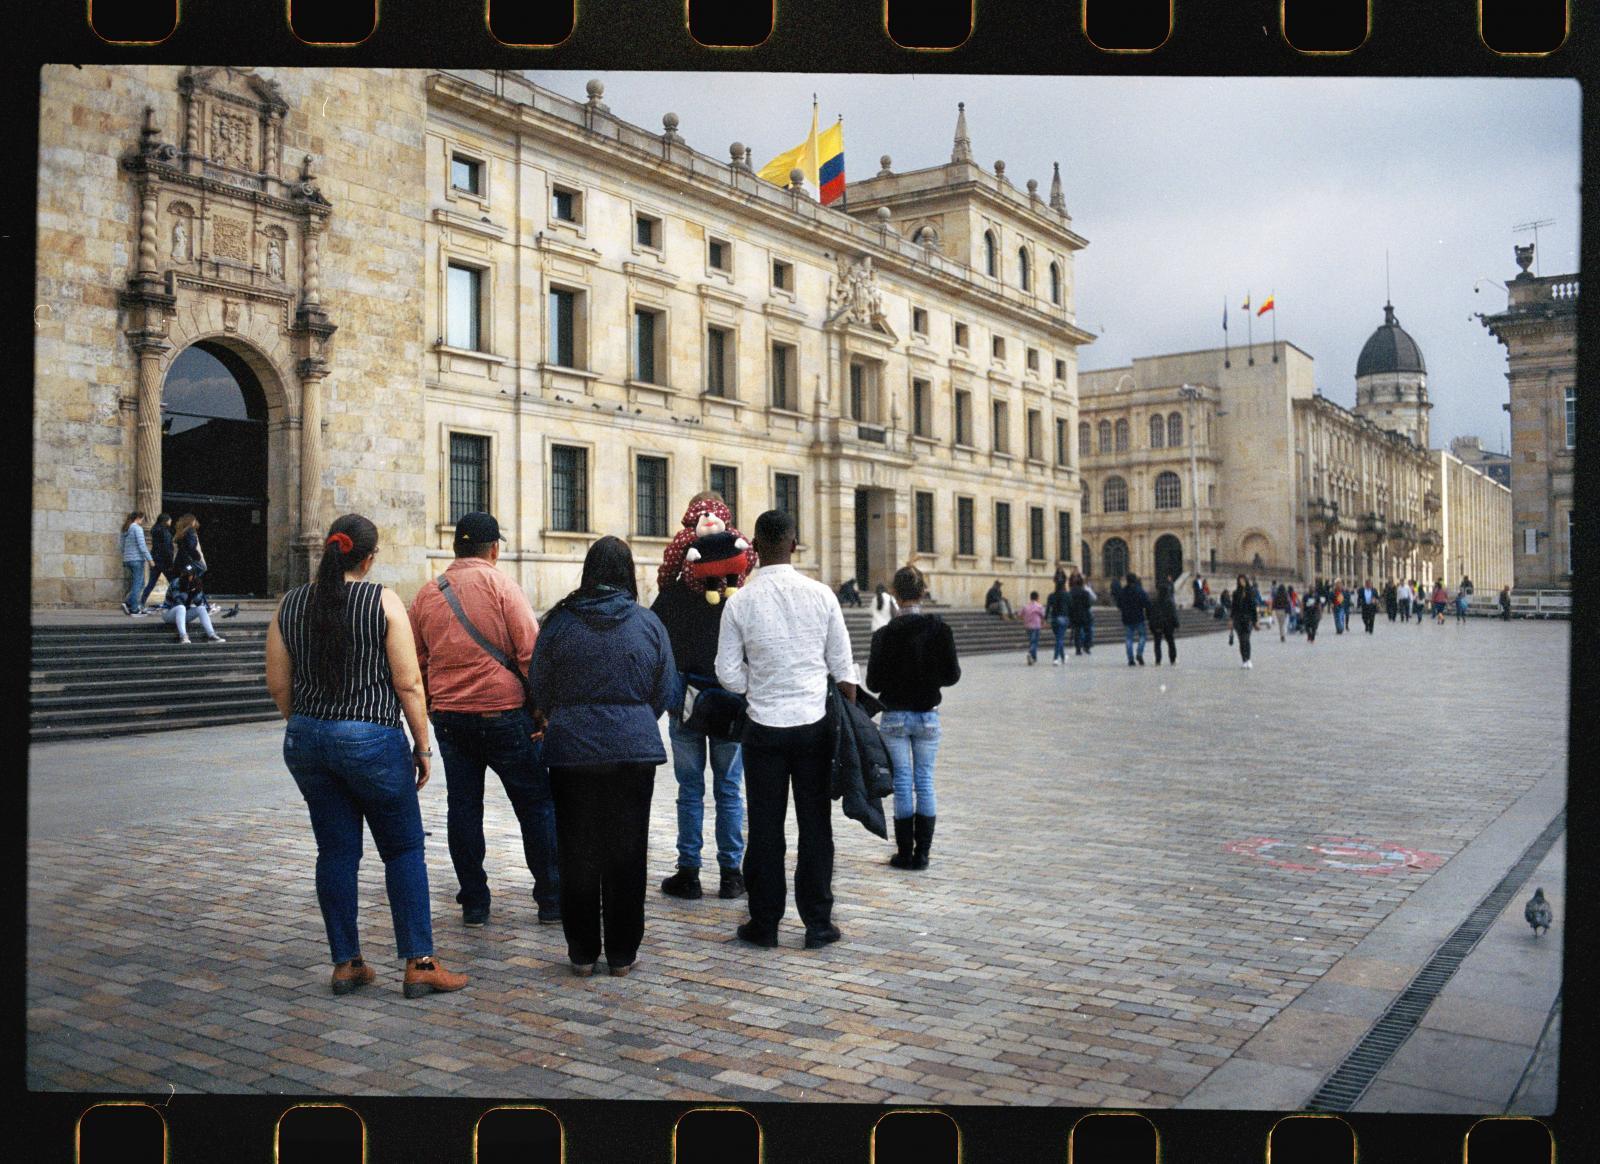 Photography image - Loading BogotaAmenazada-14.jpg